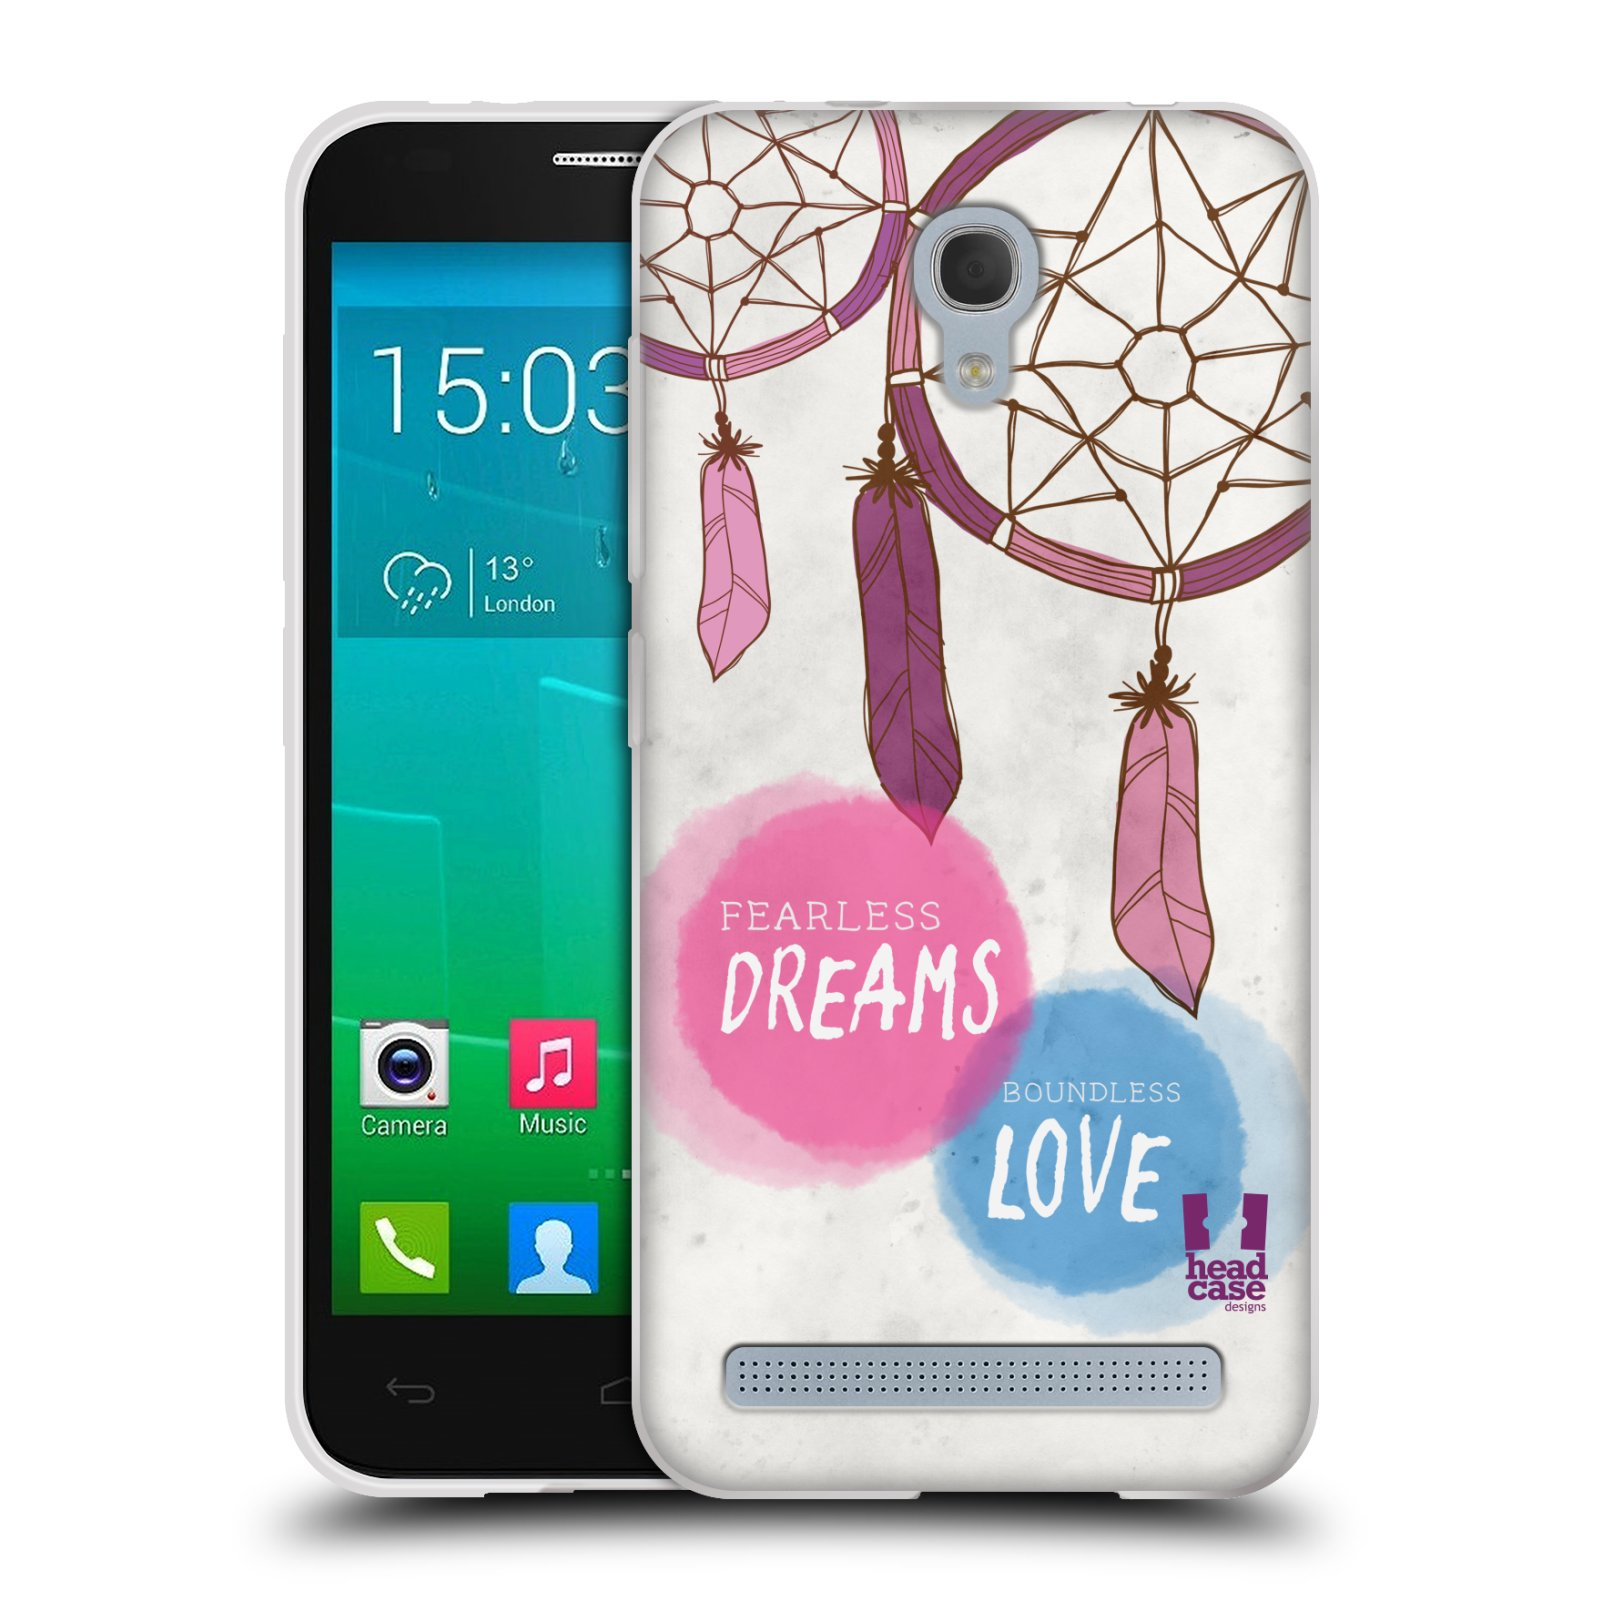 Silikonové pouzdro na mobil Alcatel One Touch Idol 2 Mini S 6036Y HEAD CASE LAPAČ FEARLESS (Silikonový kryt či obal na mobilní telefon Alcatel Idol 2 Mini S OT-6036Y)